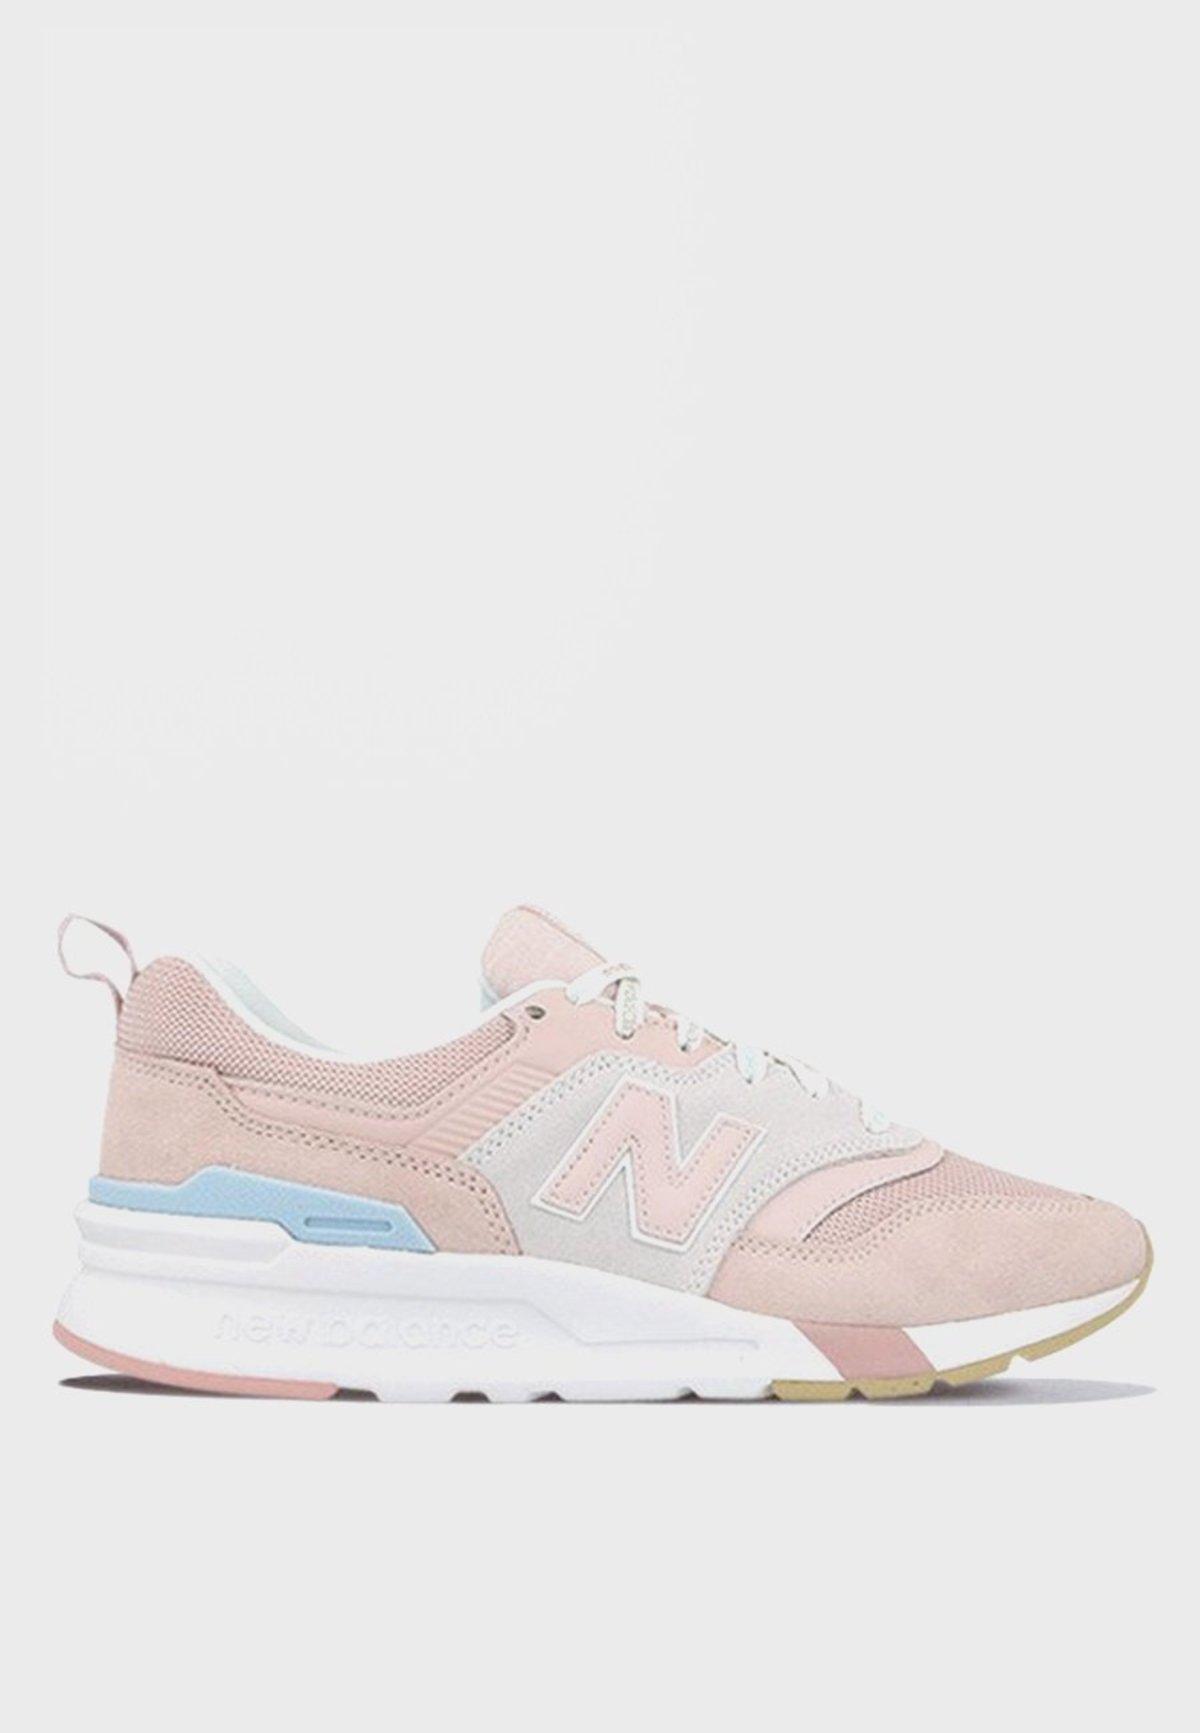 new balance 997s rosa